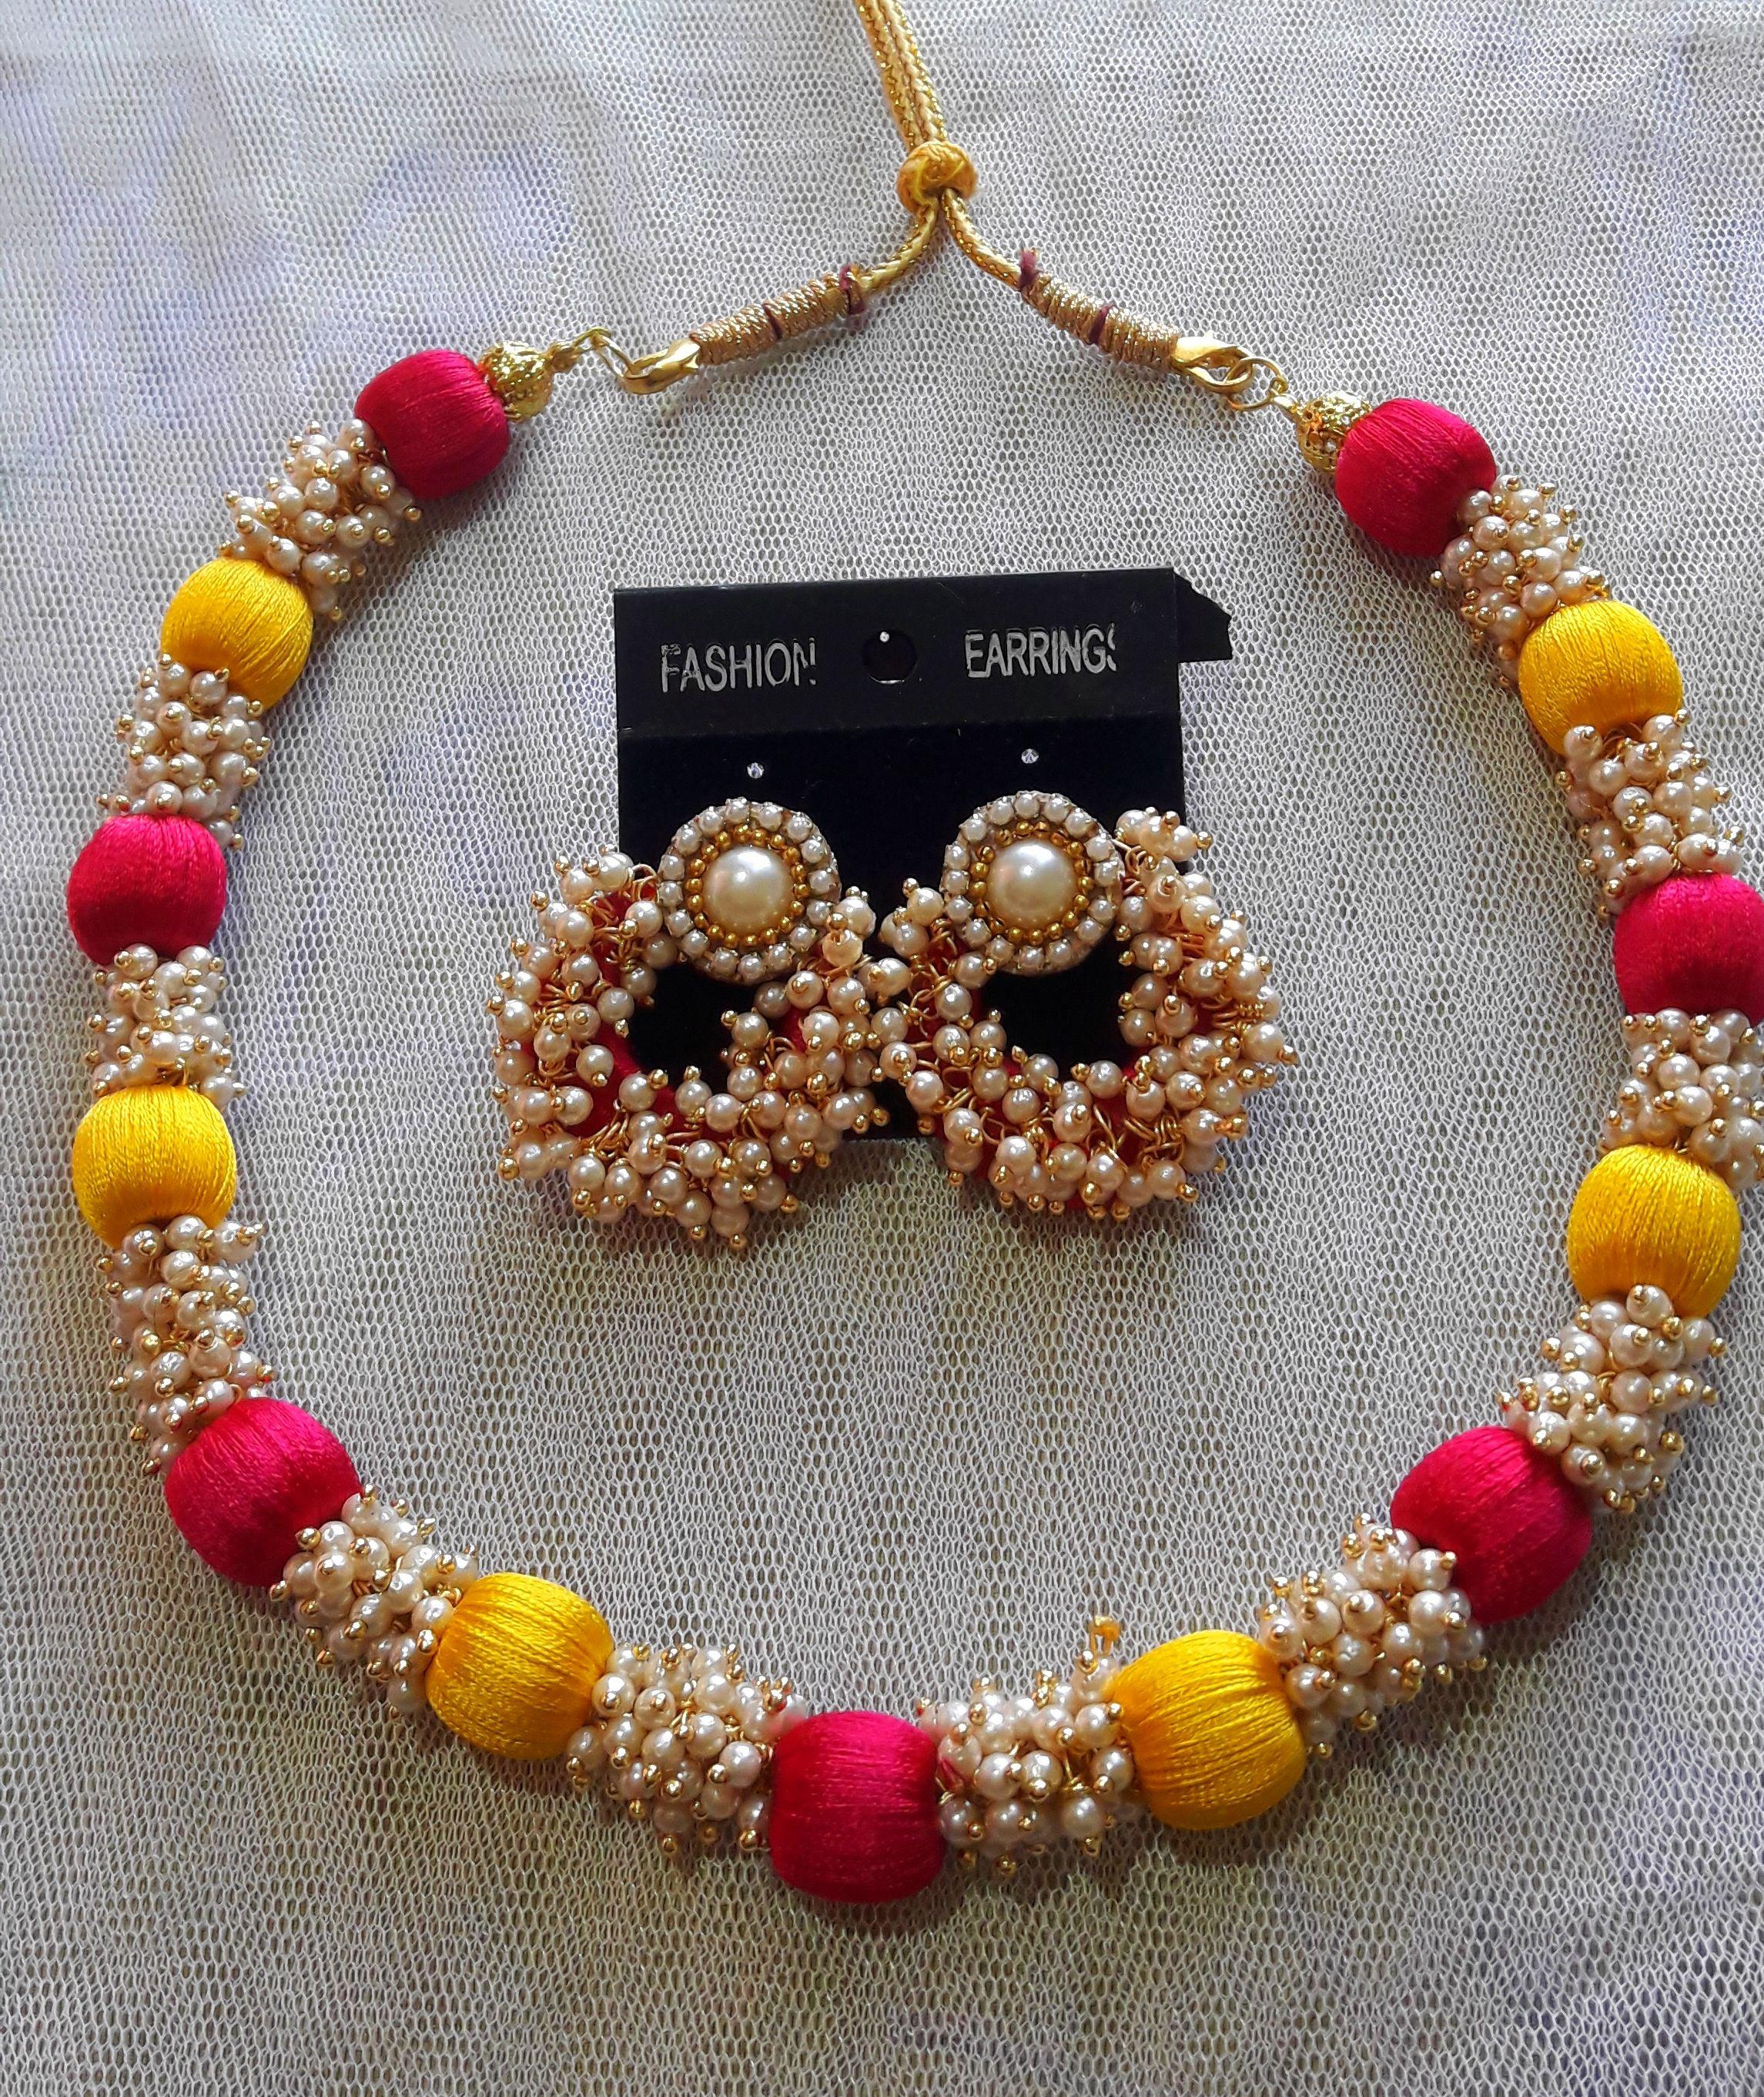 fed42fda29 #Handmade #Pink, #yellow #silk #thread and #loreal #pearls necklace set. -  #prasadsilkthreadjewellery